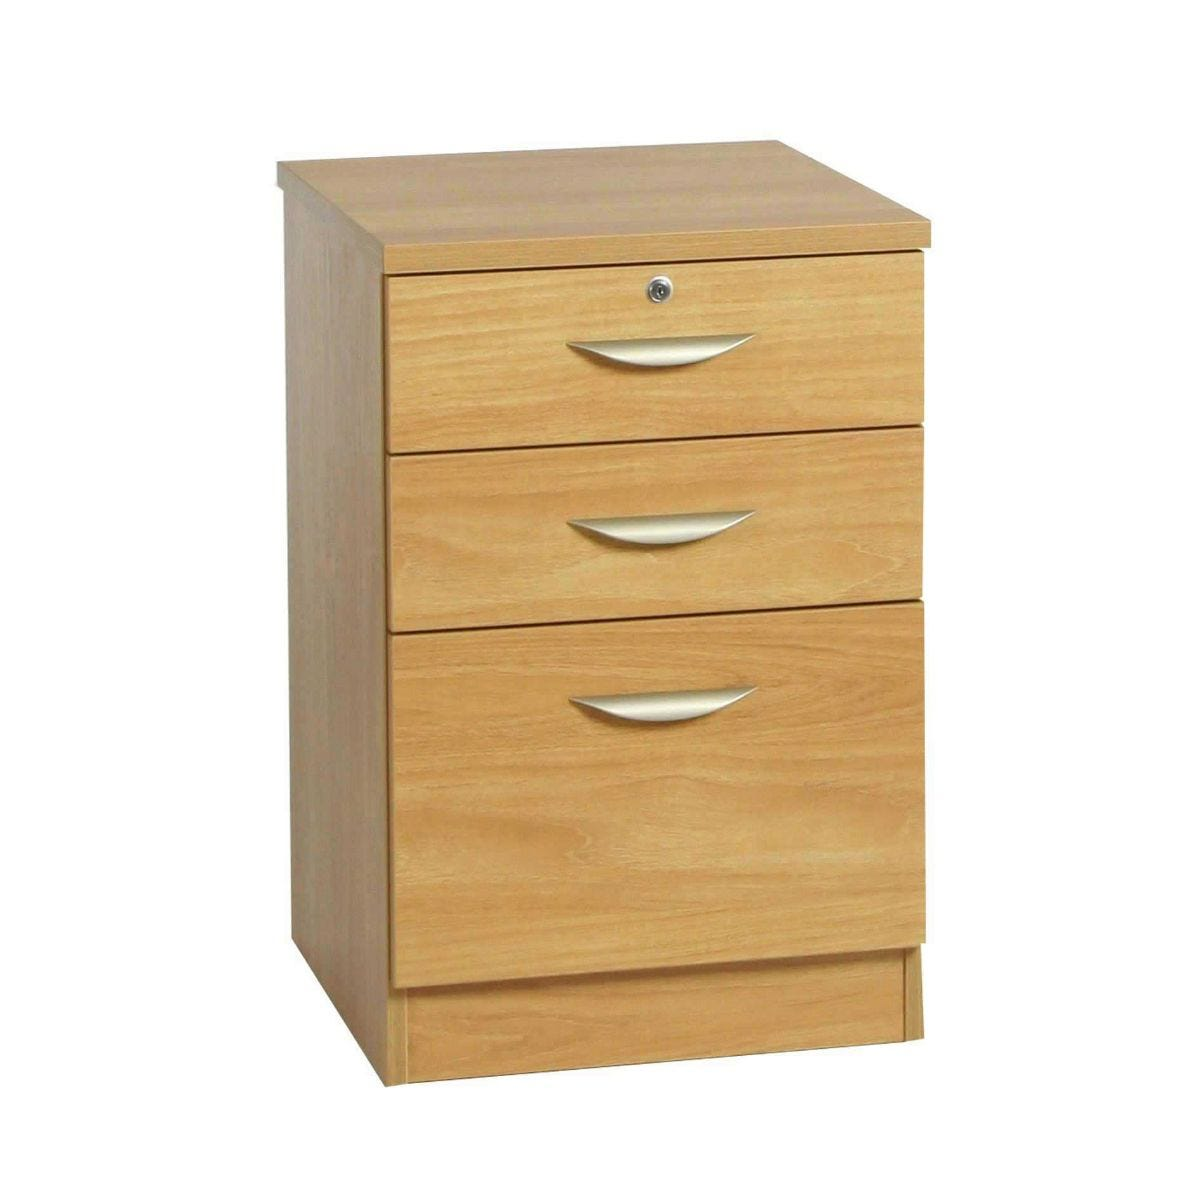 R White Combination Cabinet 3 Drawer B-3CU H728xW479xD540mm, Walnut